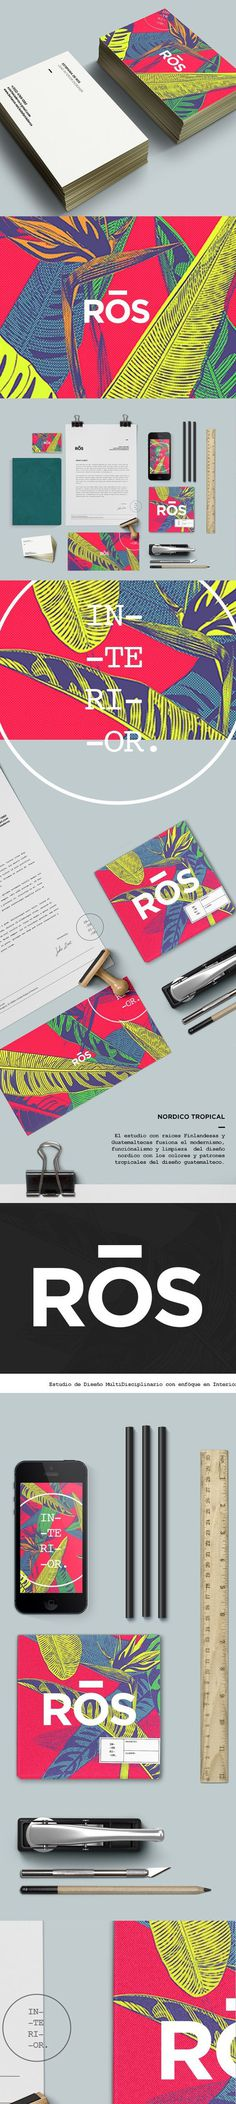 Ros #brand #identity